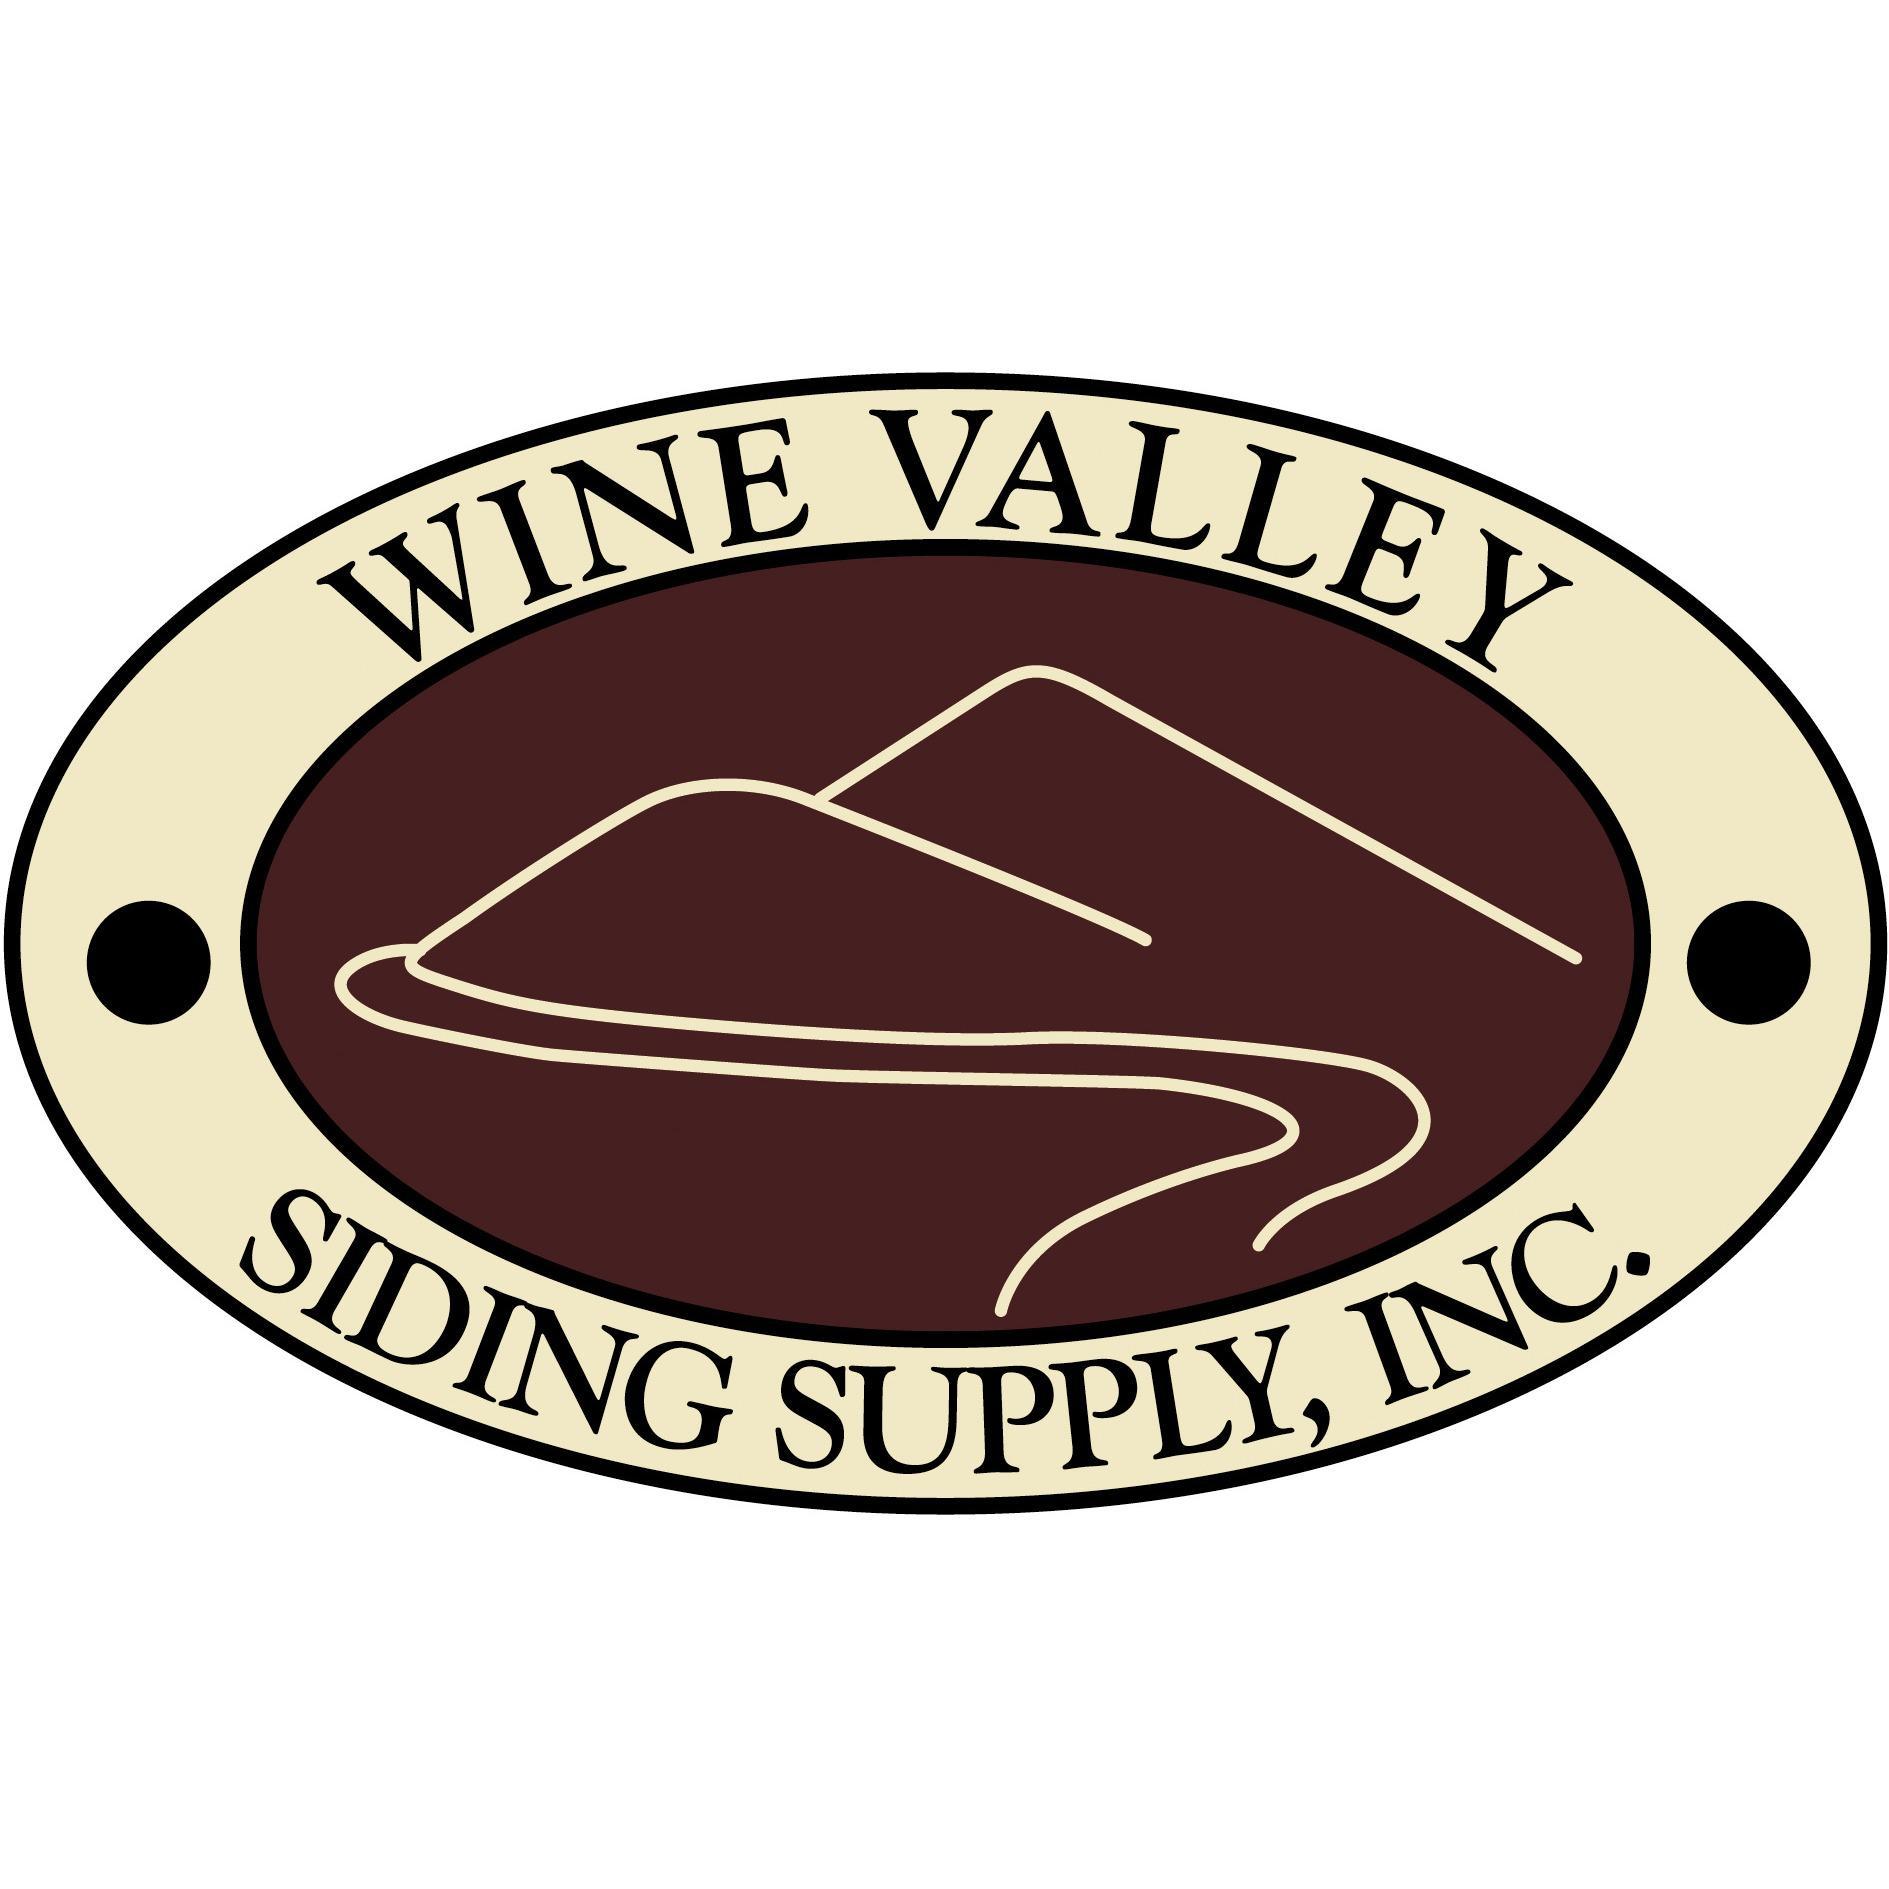 Wine Valley Siding Supply, Inc.